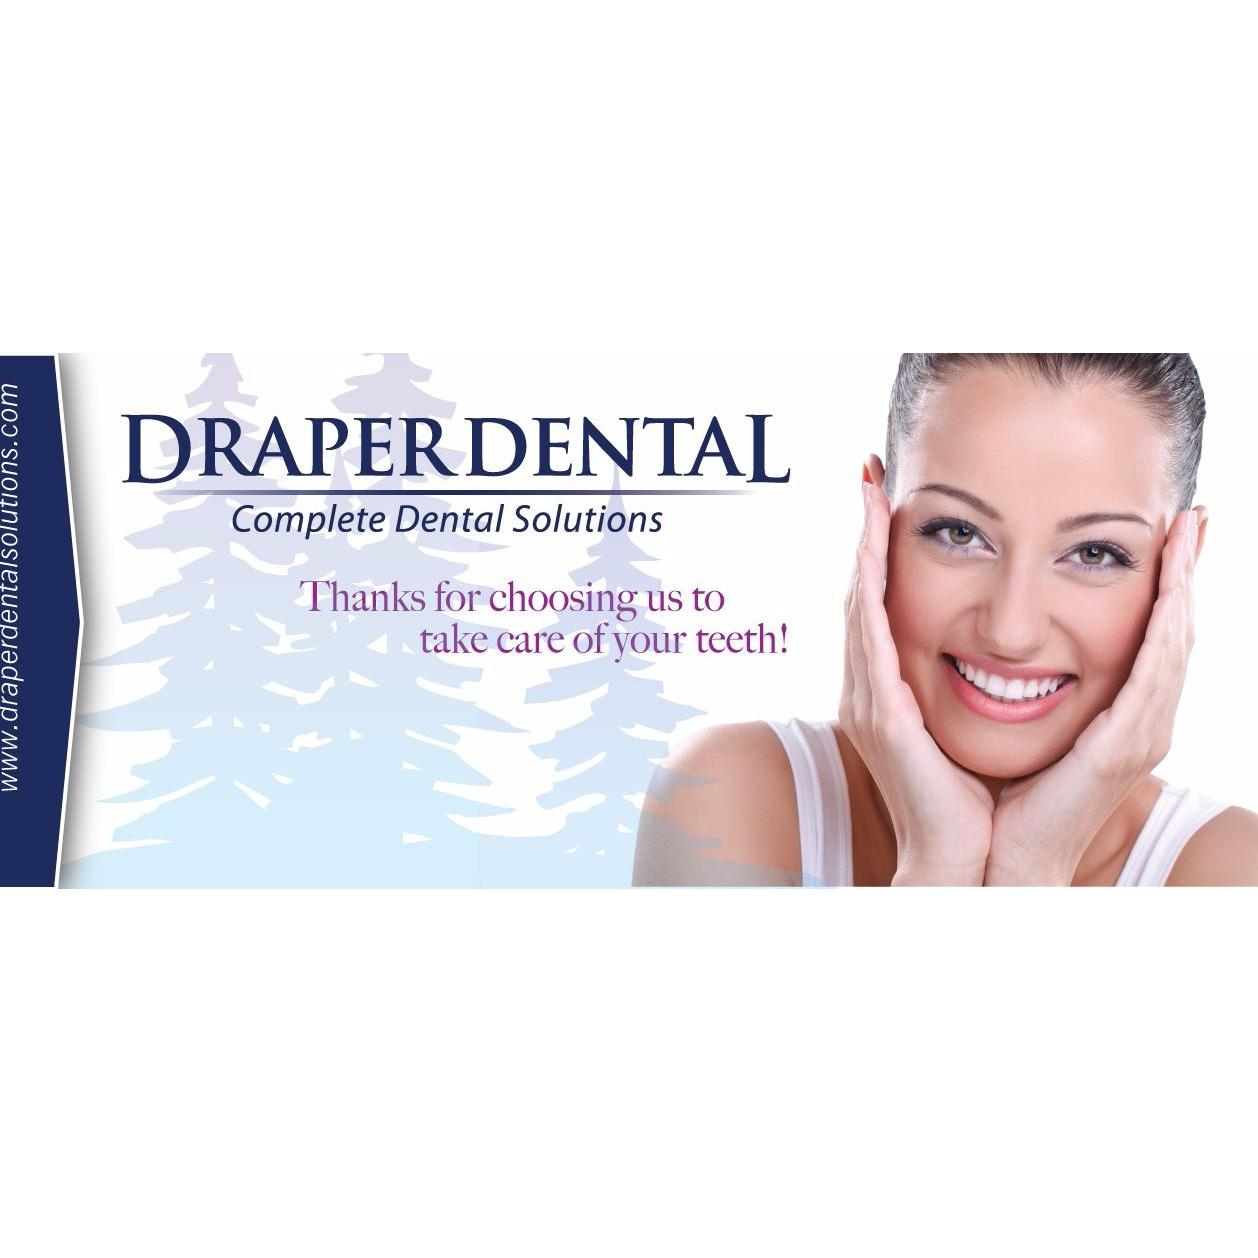 Draper Dental - Draper, UT - Dentists & Dental Services